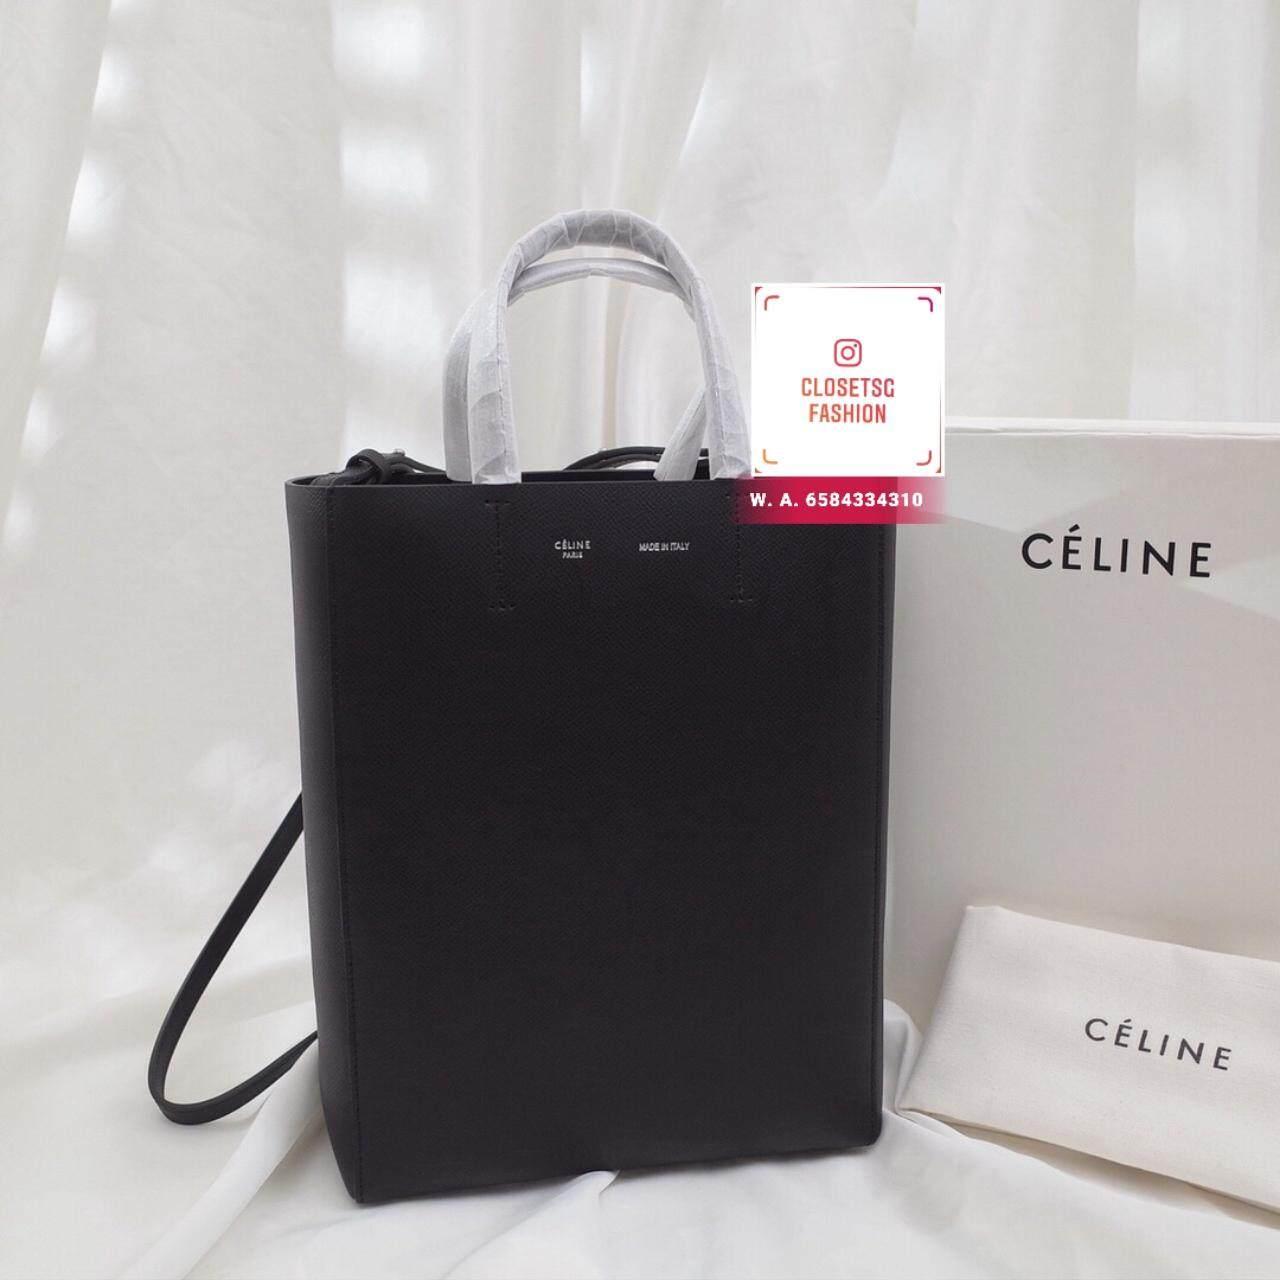 Celine - Buy Celine at Best Price in Malaysia   www.lazada.com.my 4099b6dc3e